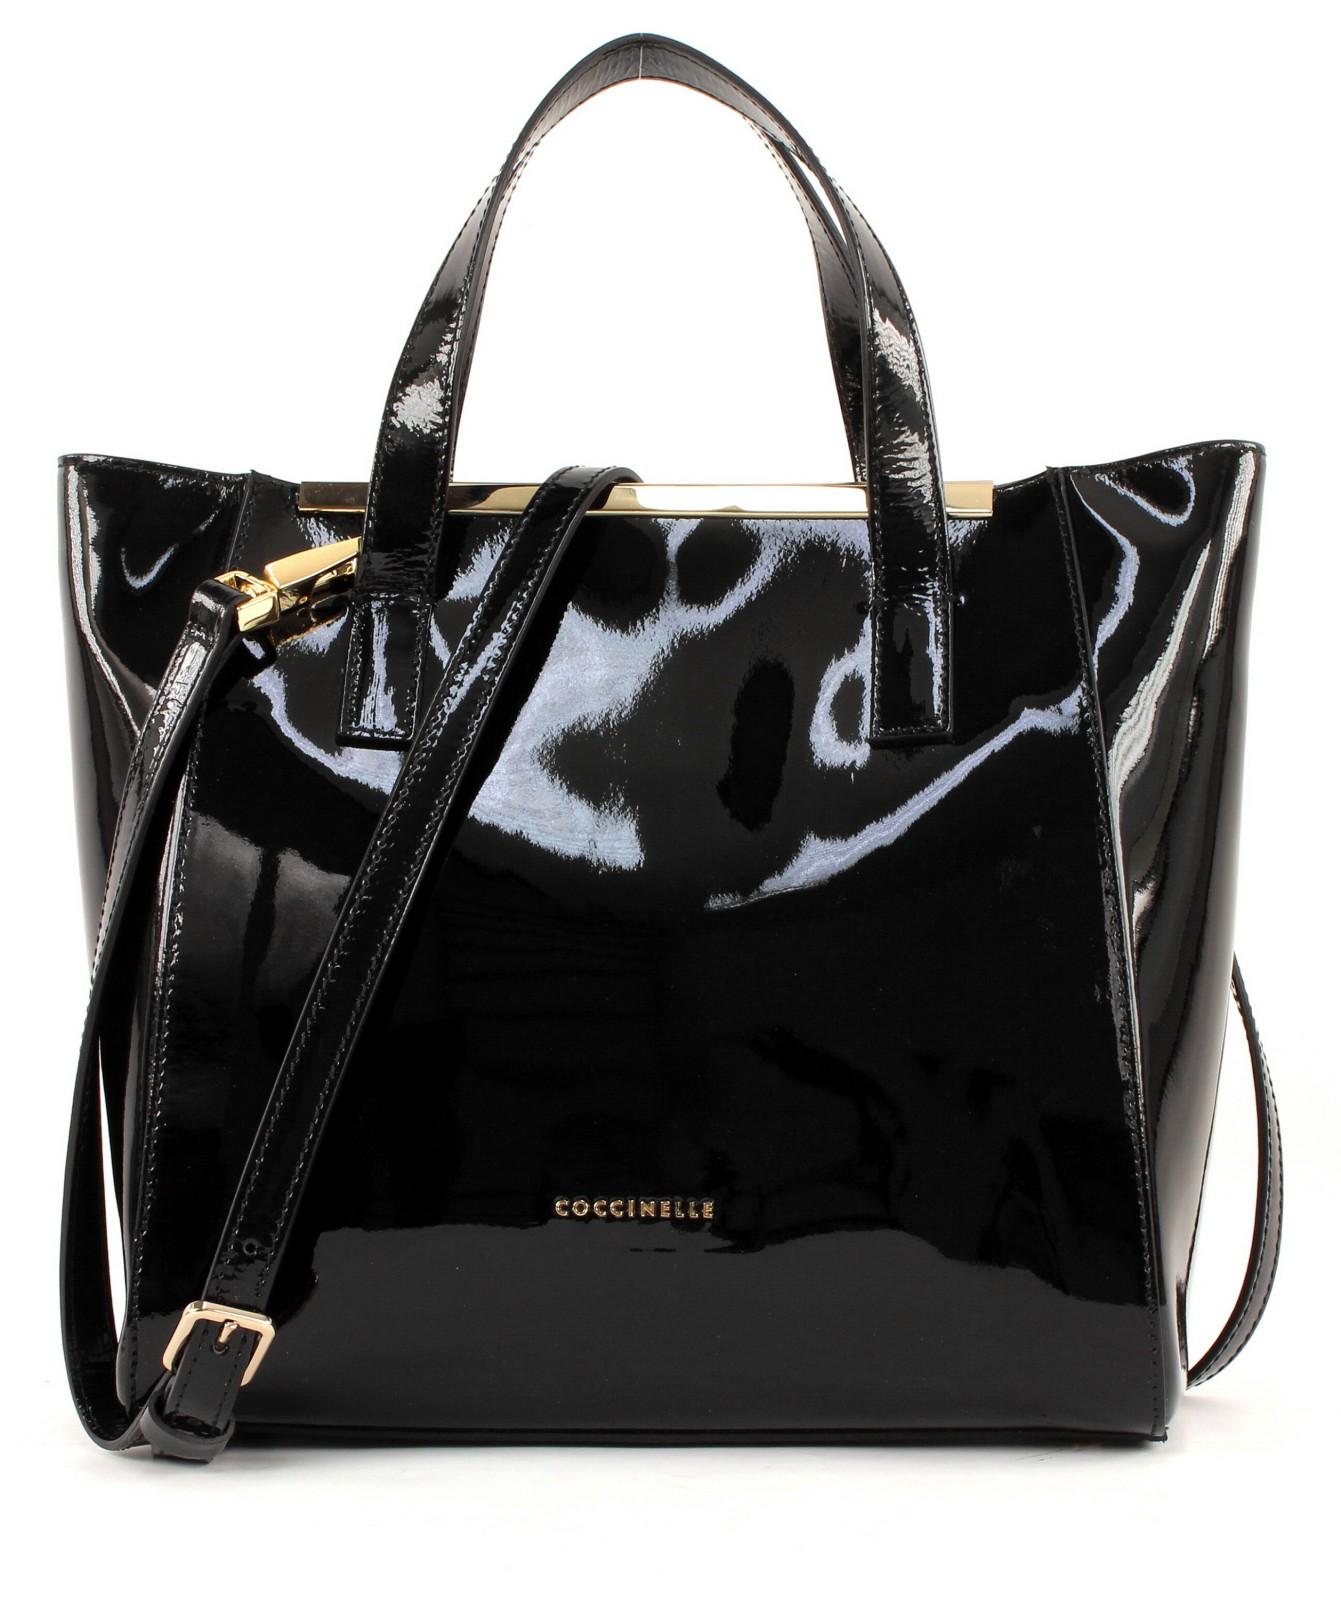 coccinelle amy shinny handbag tasche handtasche umh ngetasche damen schwarz neu ebay. Black Bedroom Furniture Sets. Home Design Ideas